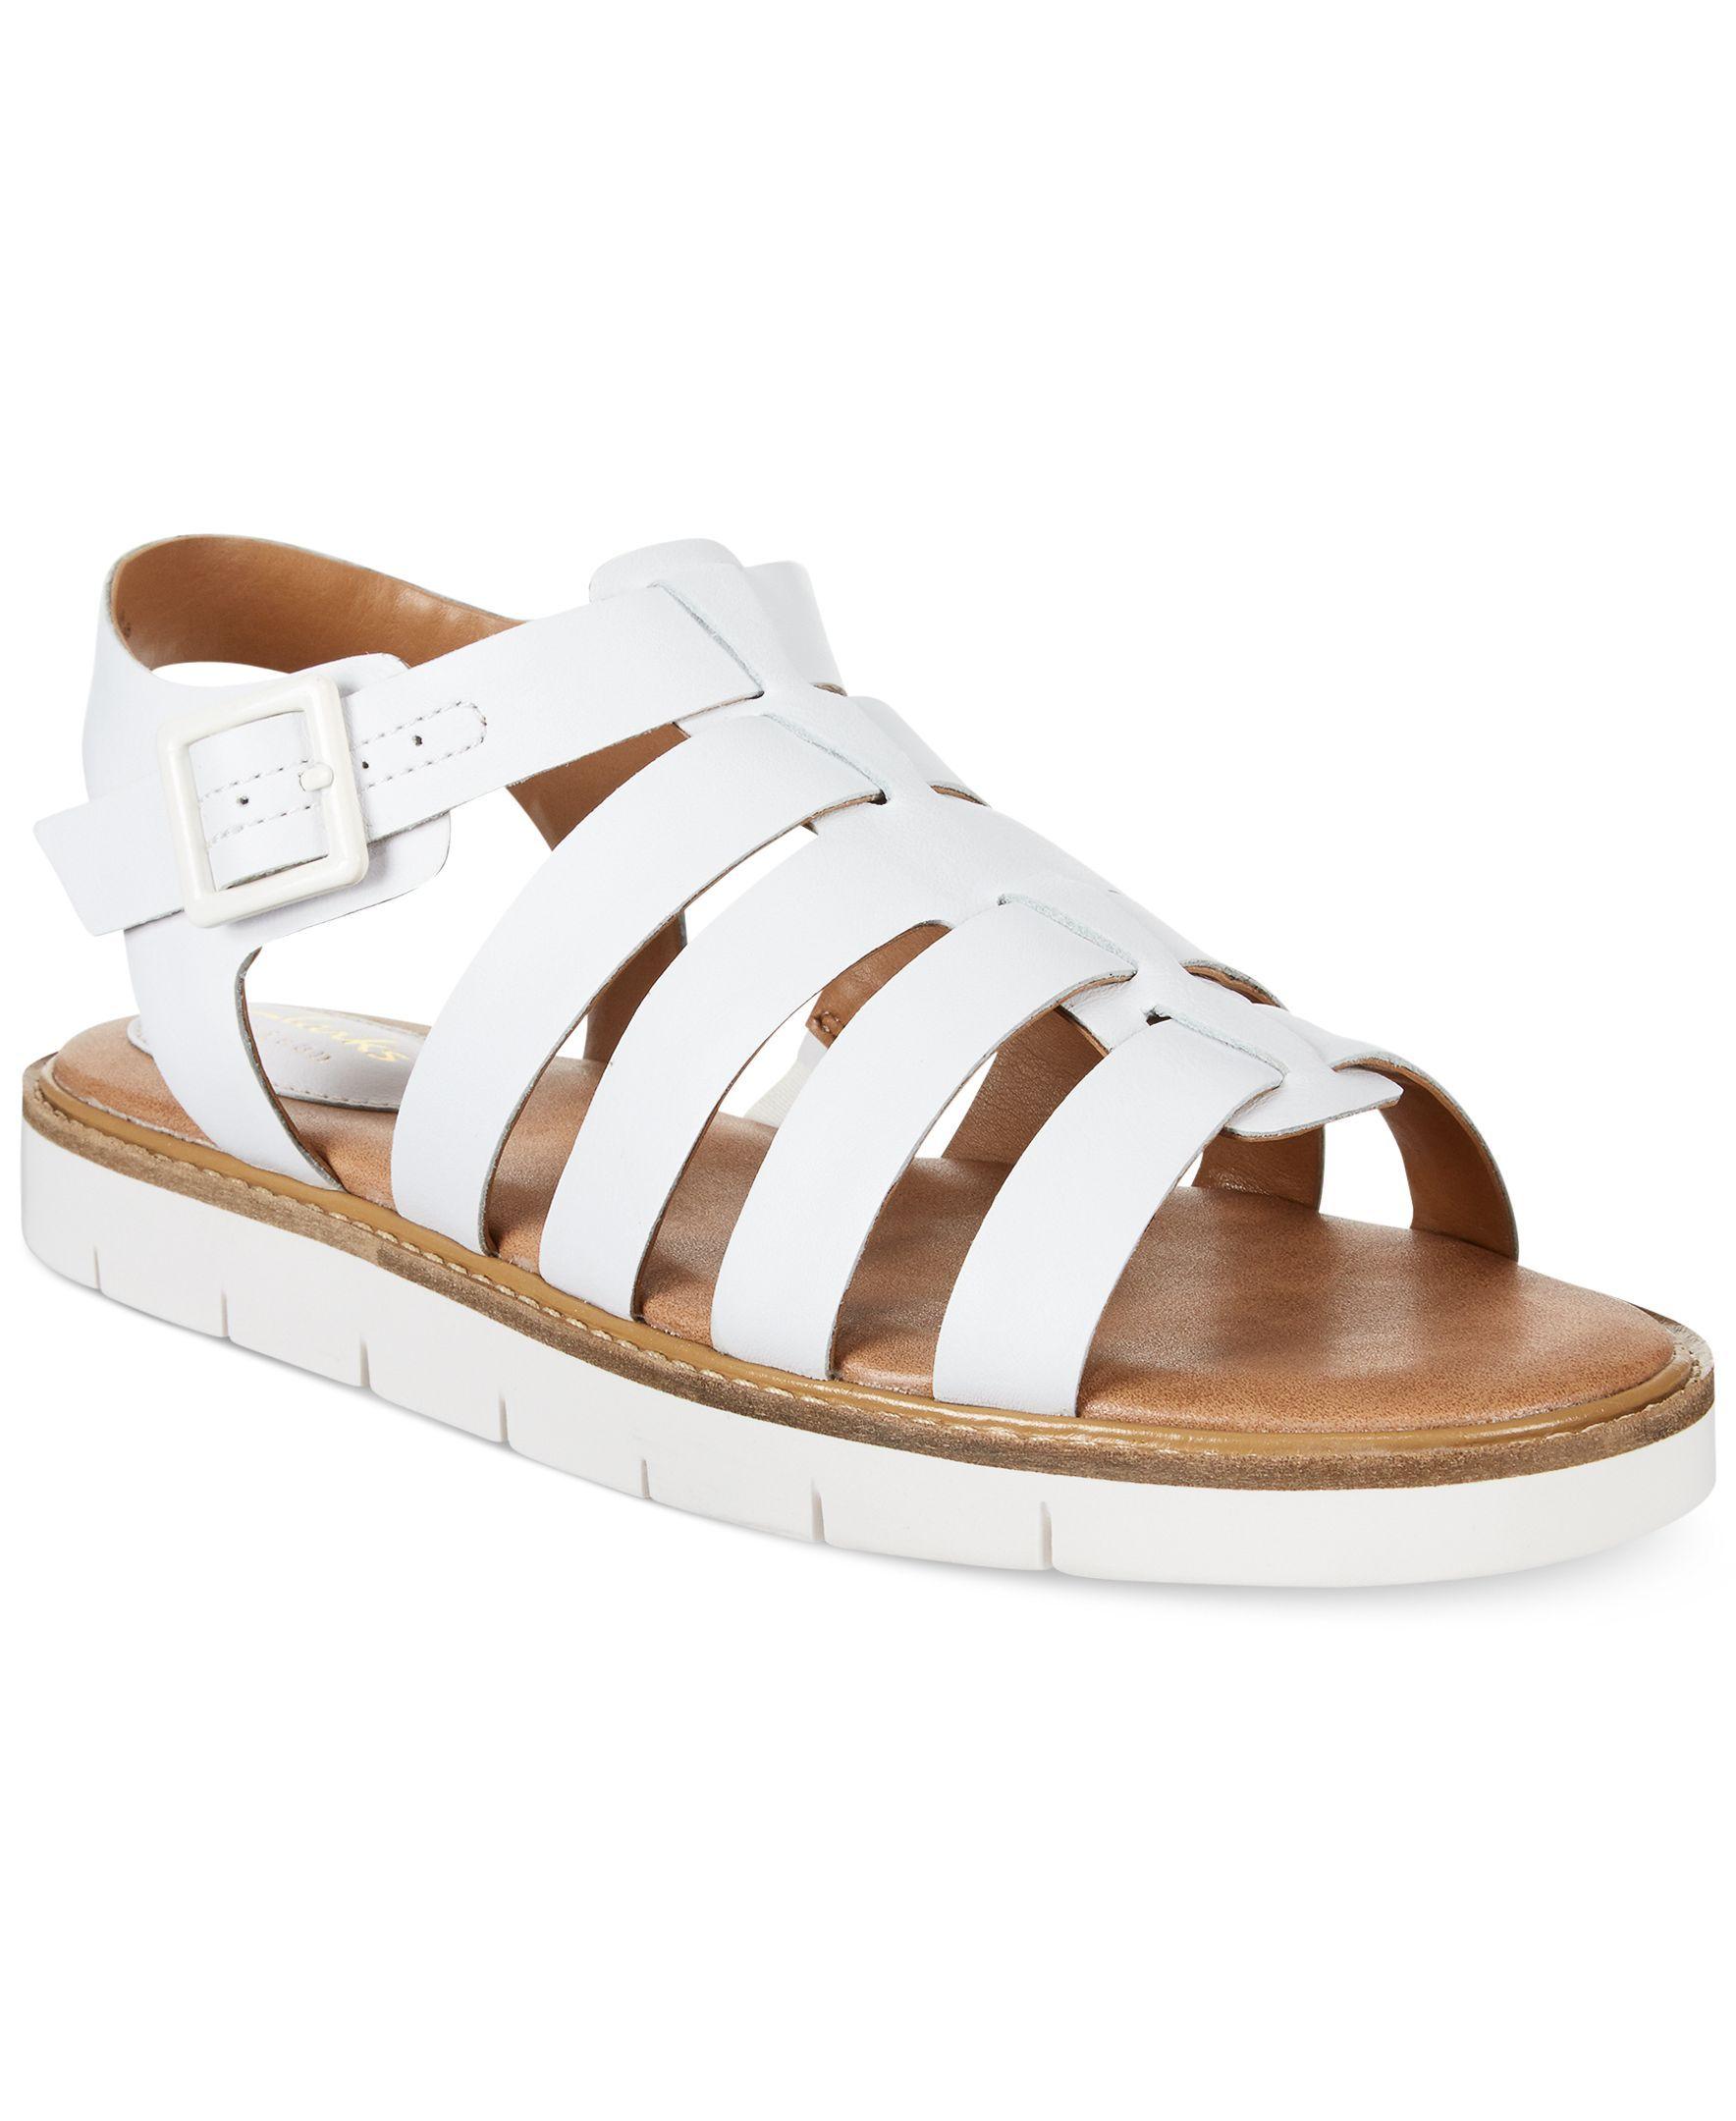 f3ccebd5458 Clarks Artisan Women s Lydie Kona Flat Sandals